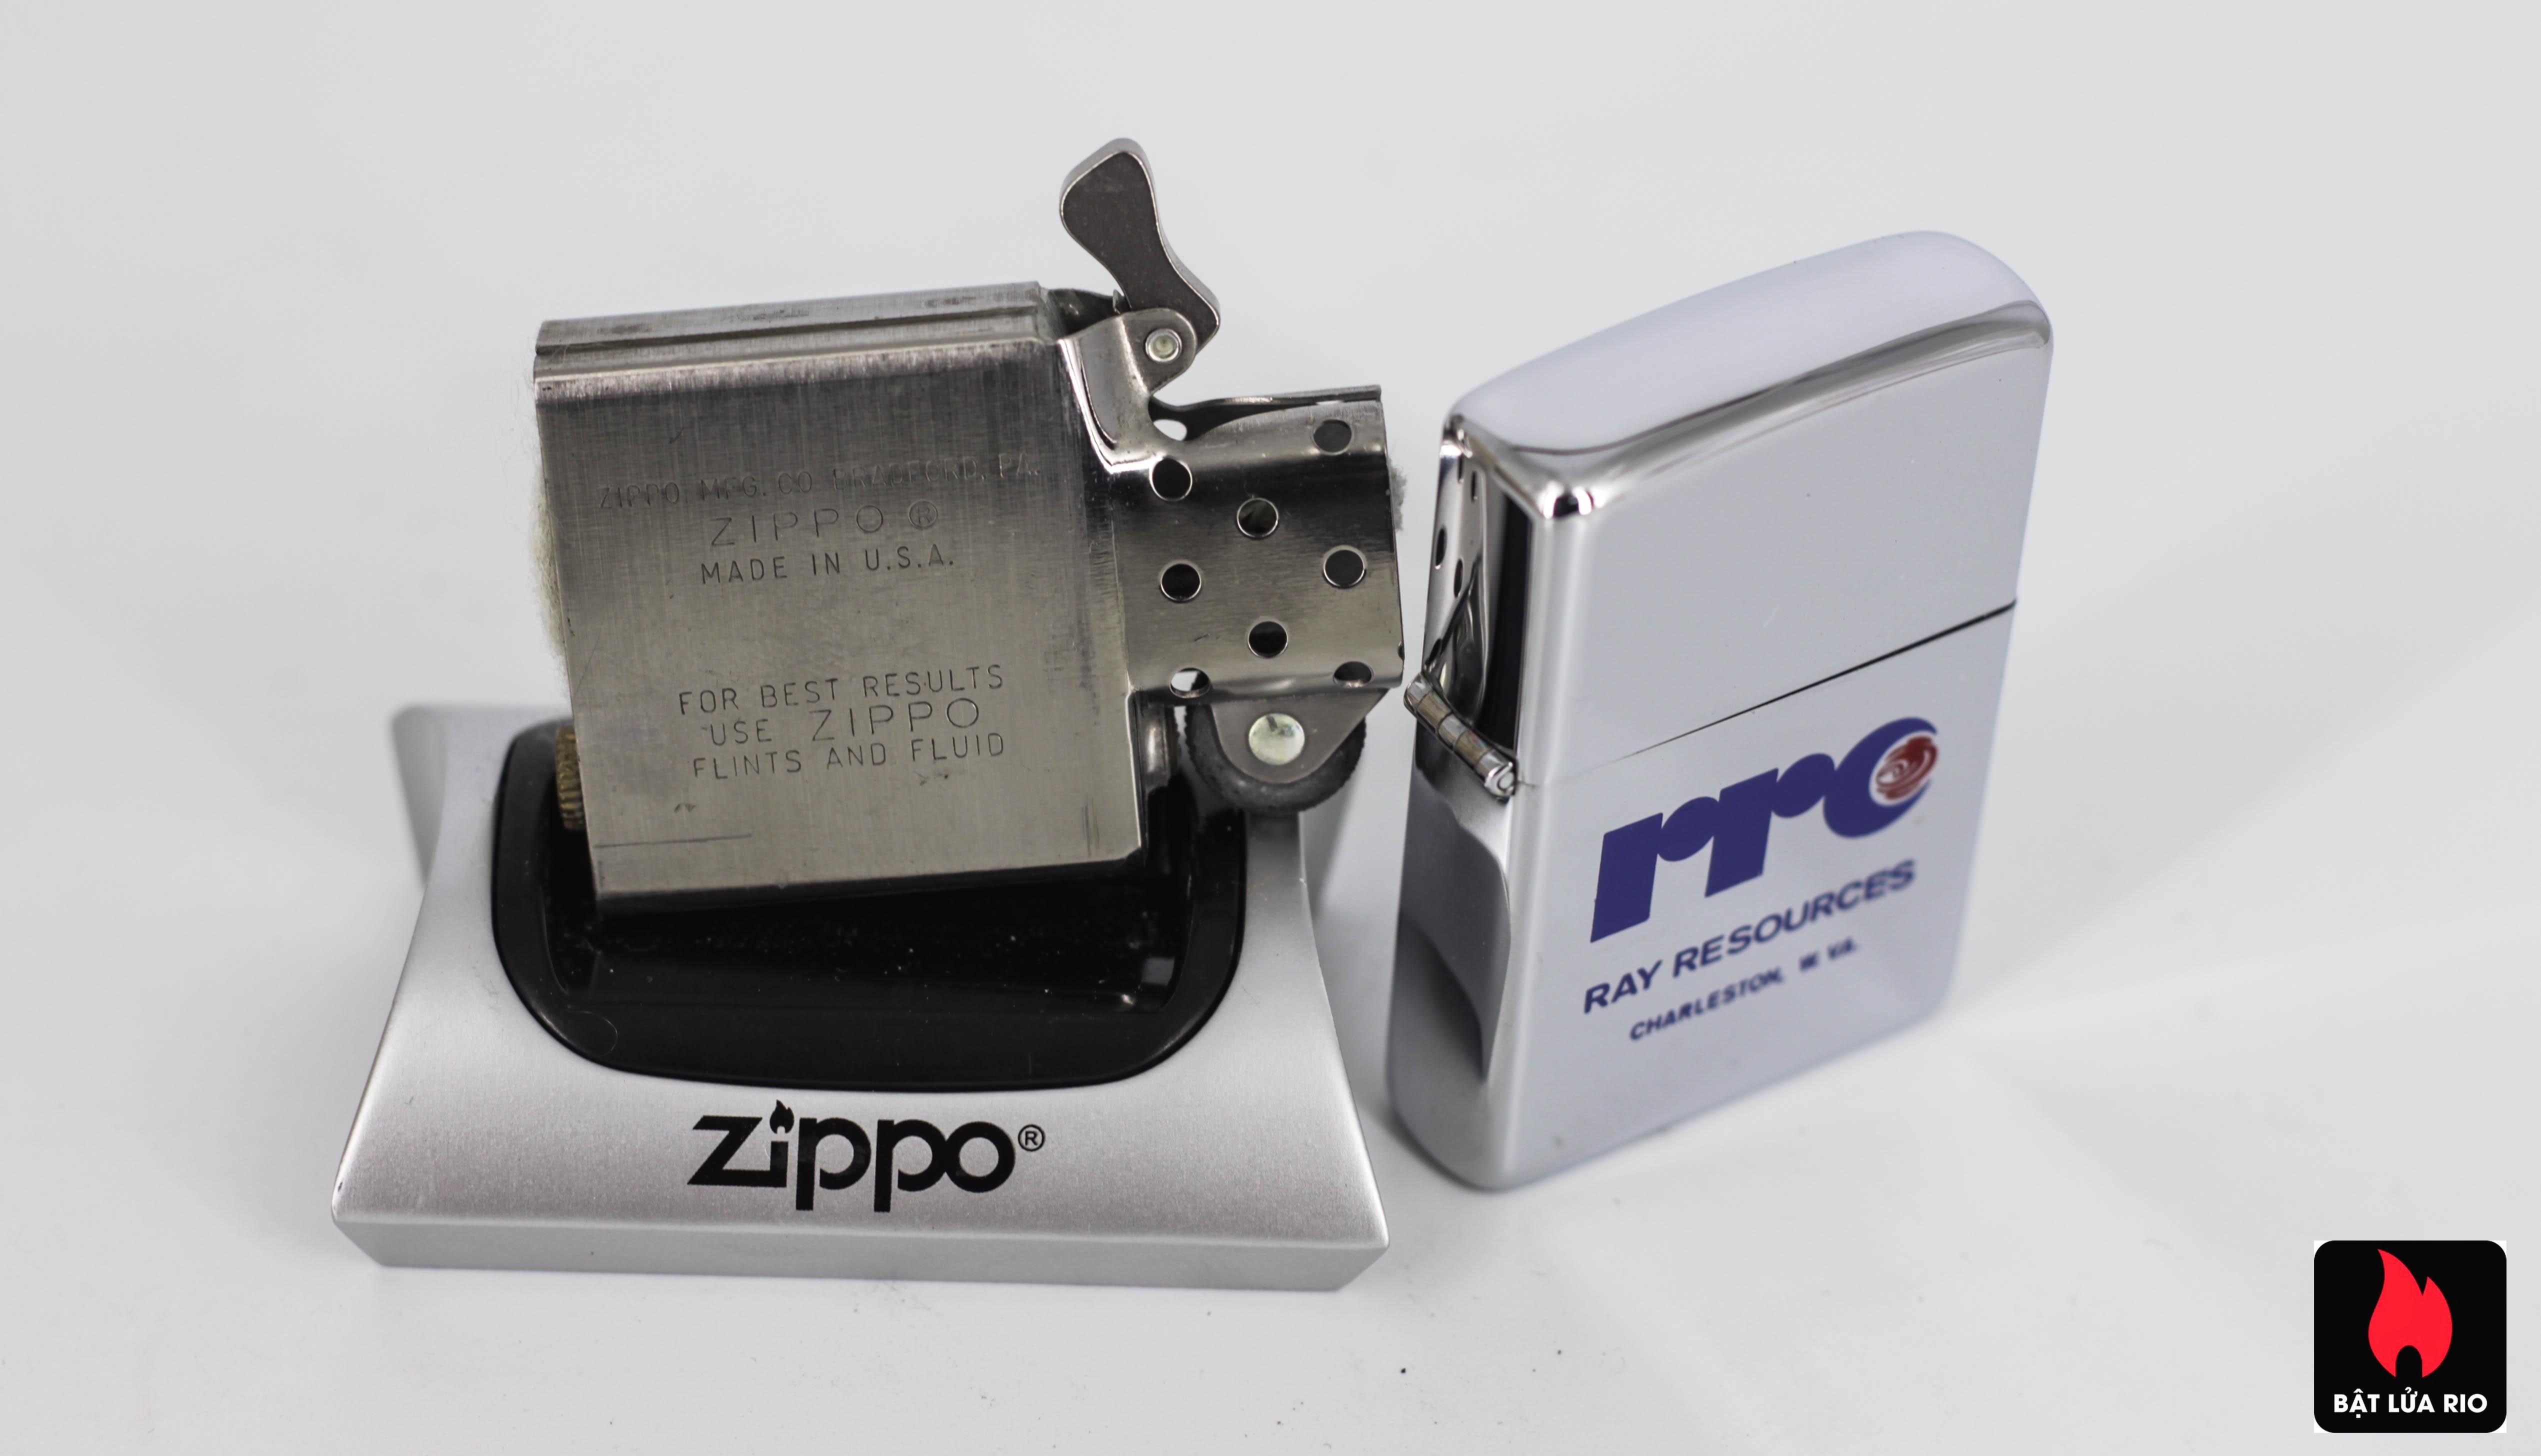 ZIPPO XƯA 1980 - RAY RESOURCES